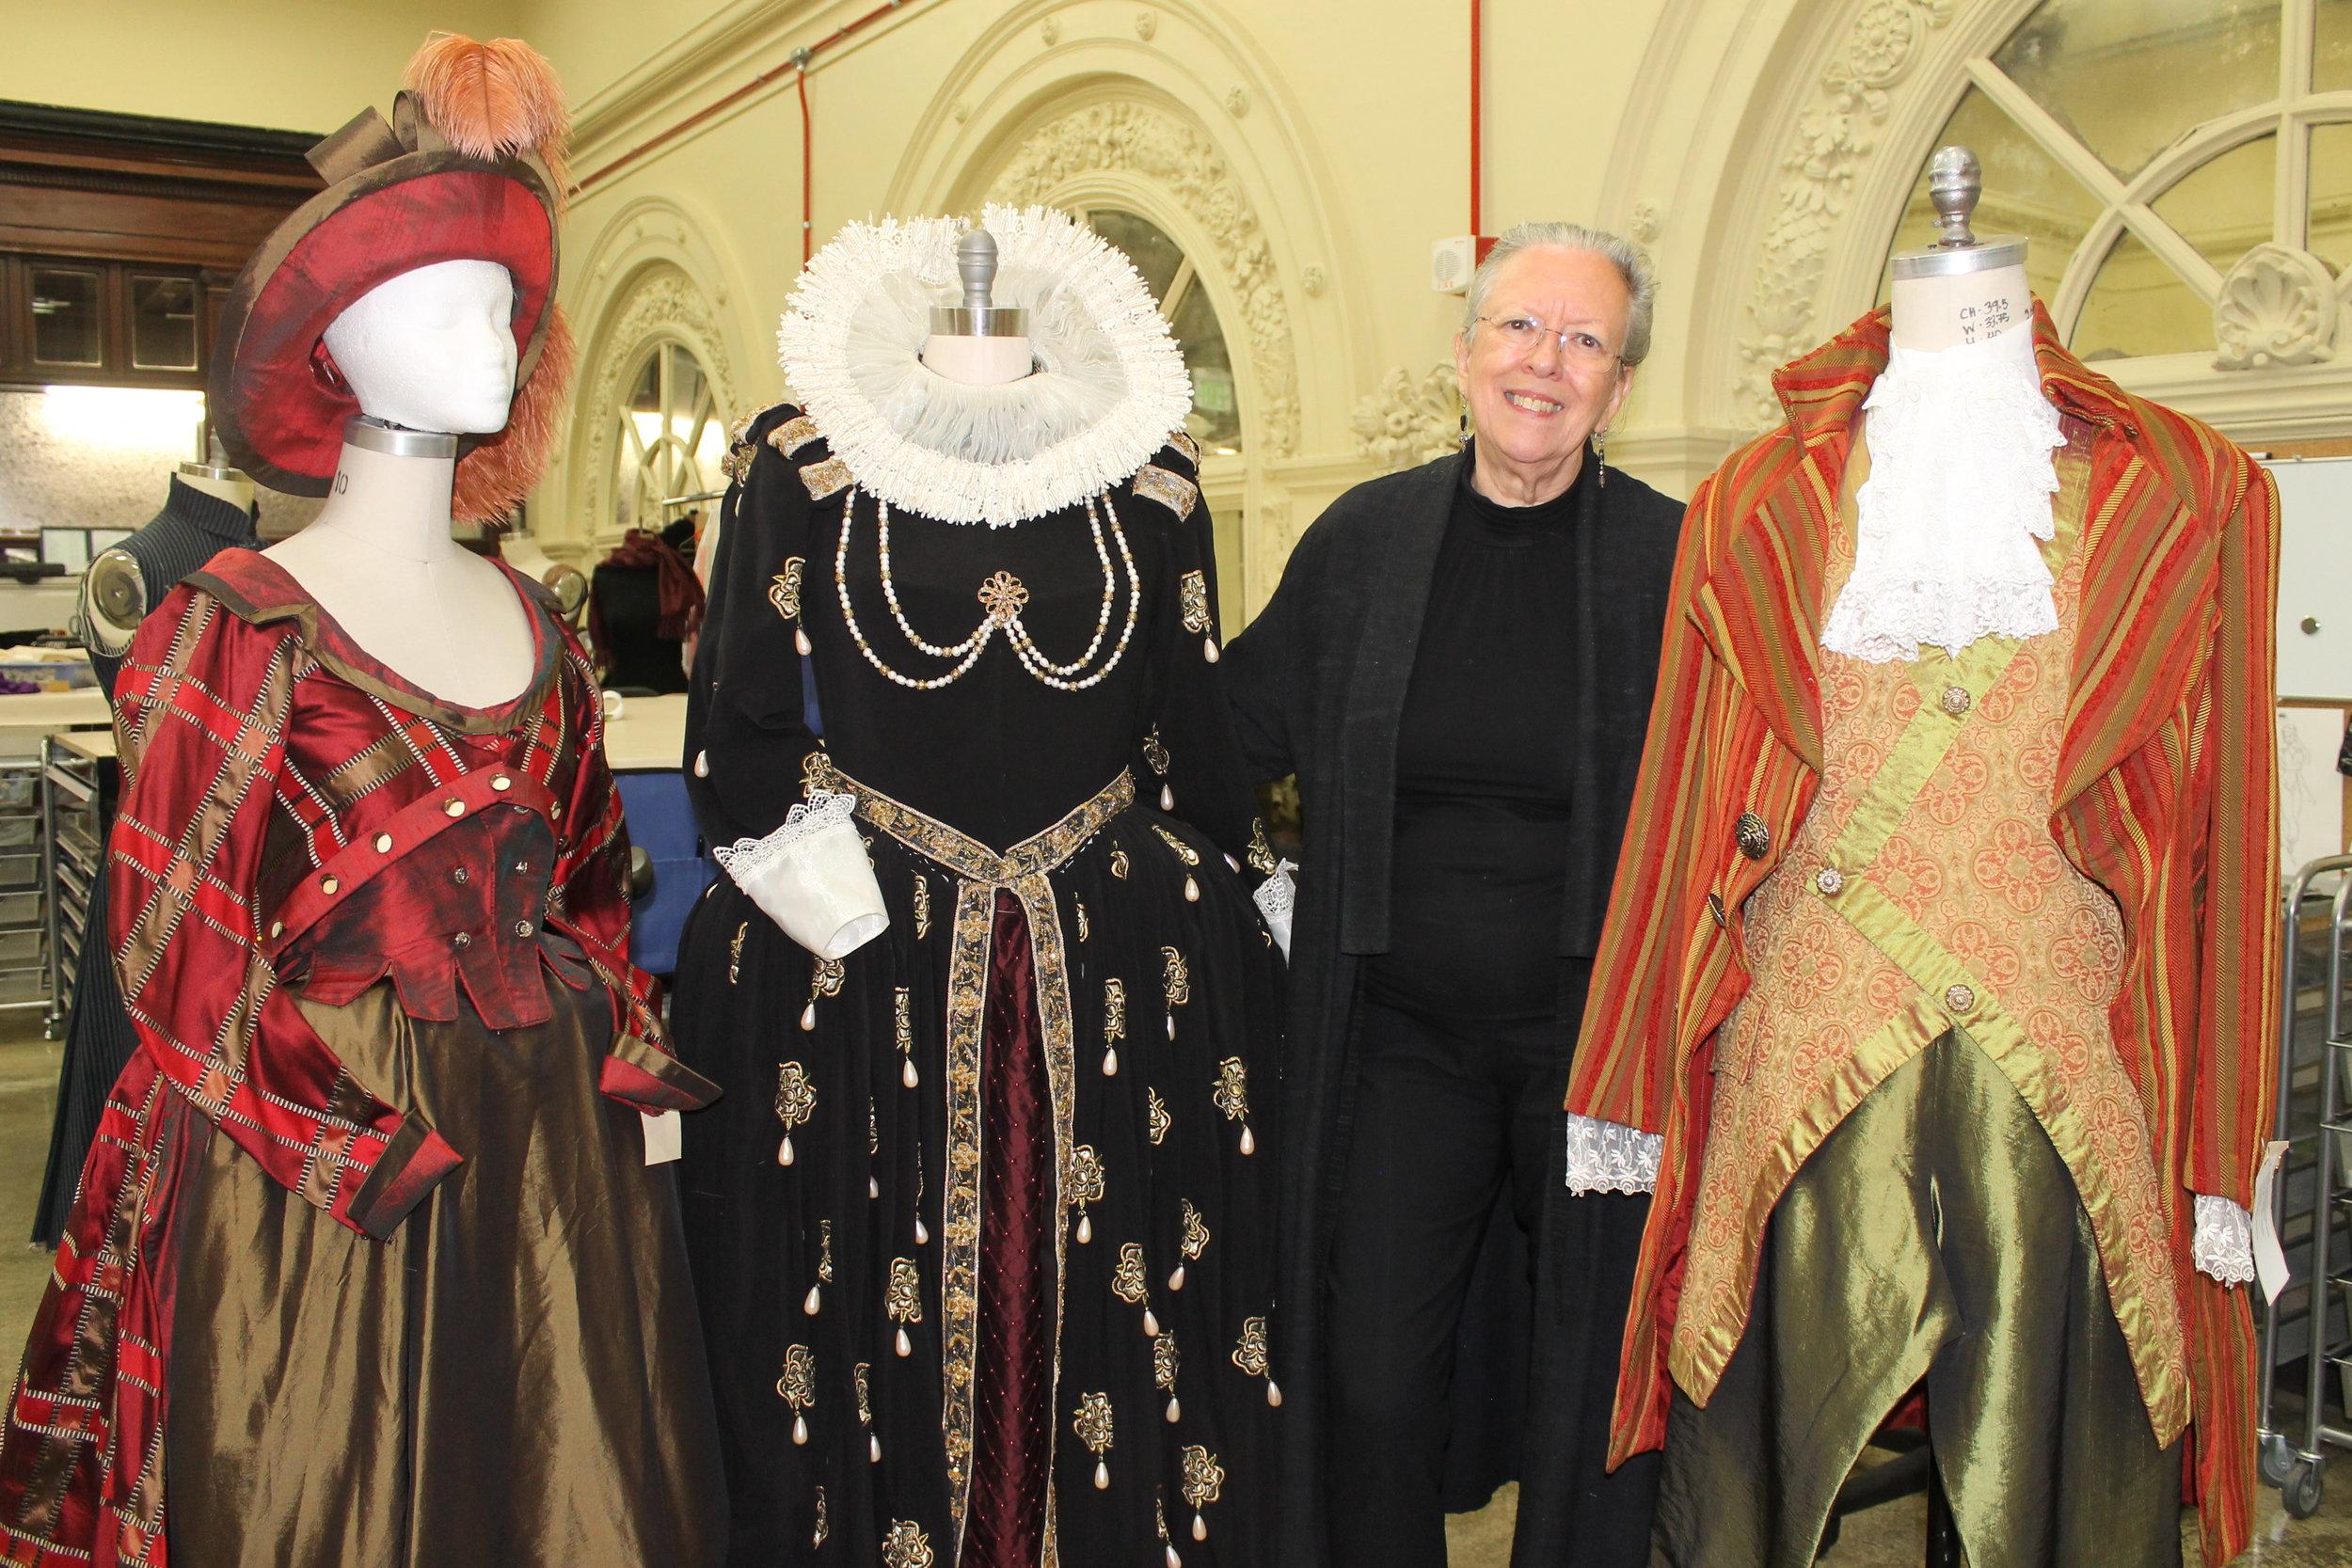 Joan Markert  - PNWF 2019 Lifetime Achievement Award Honoree